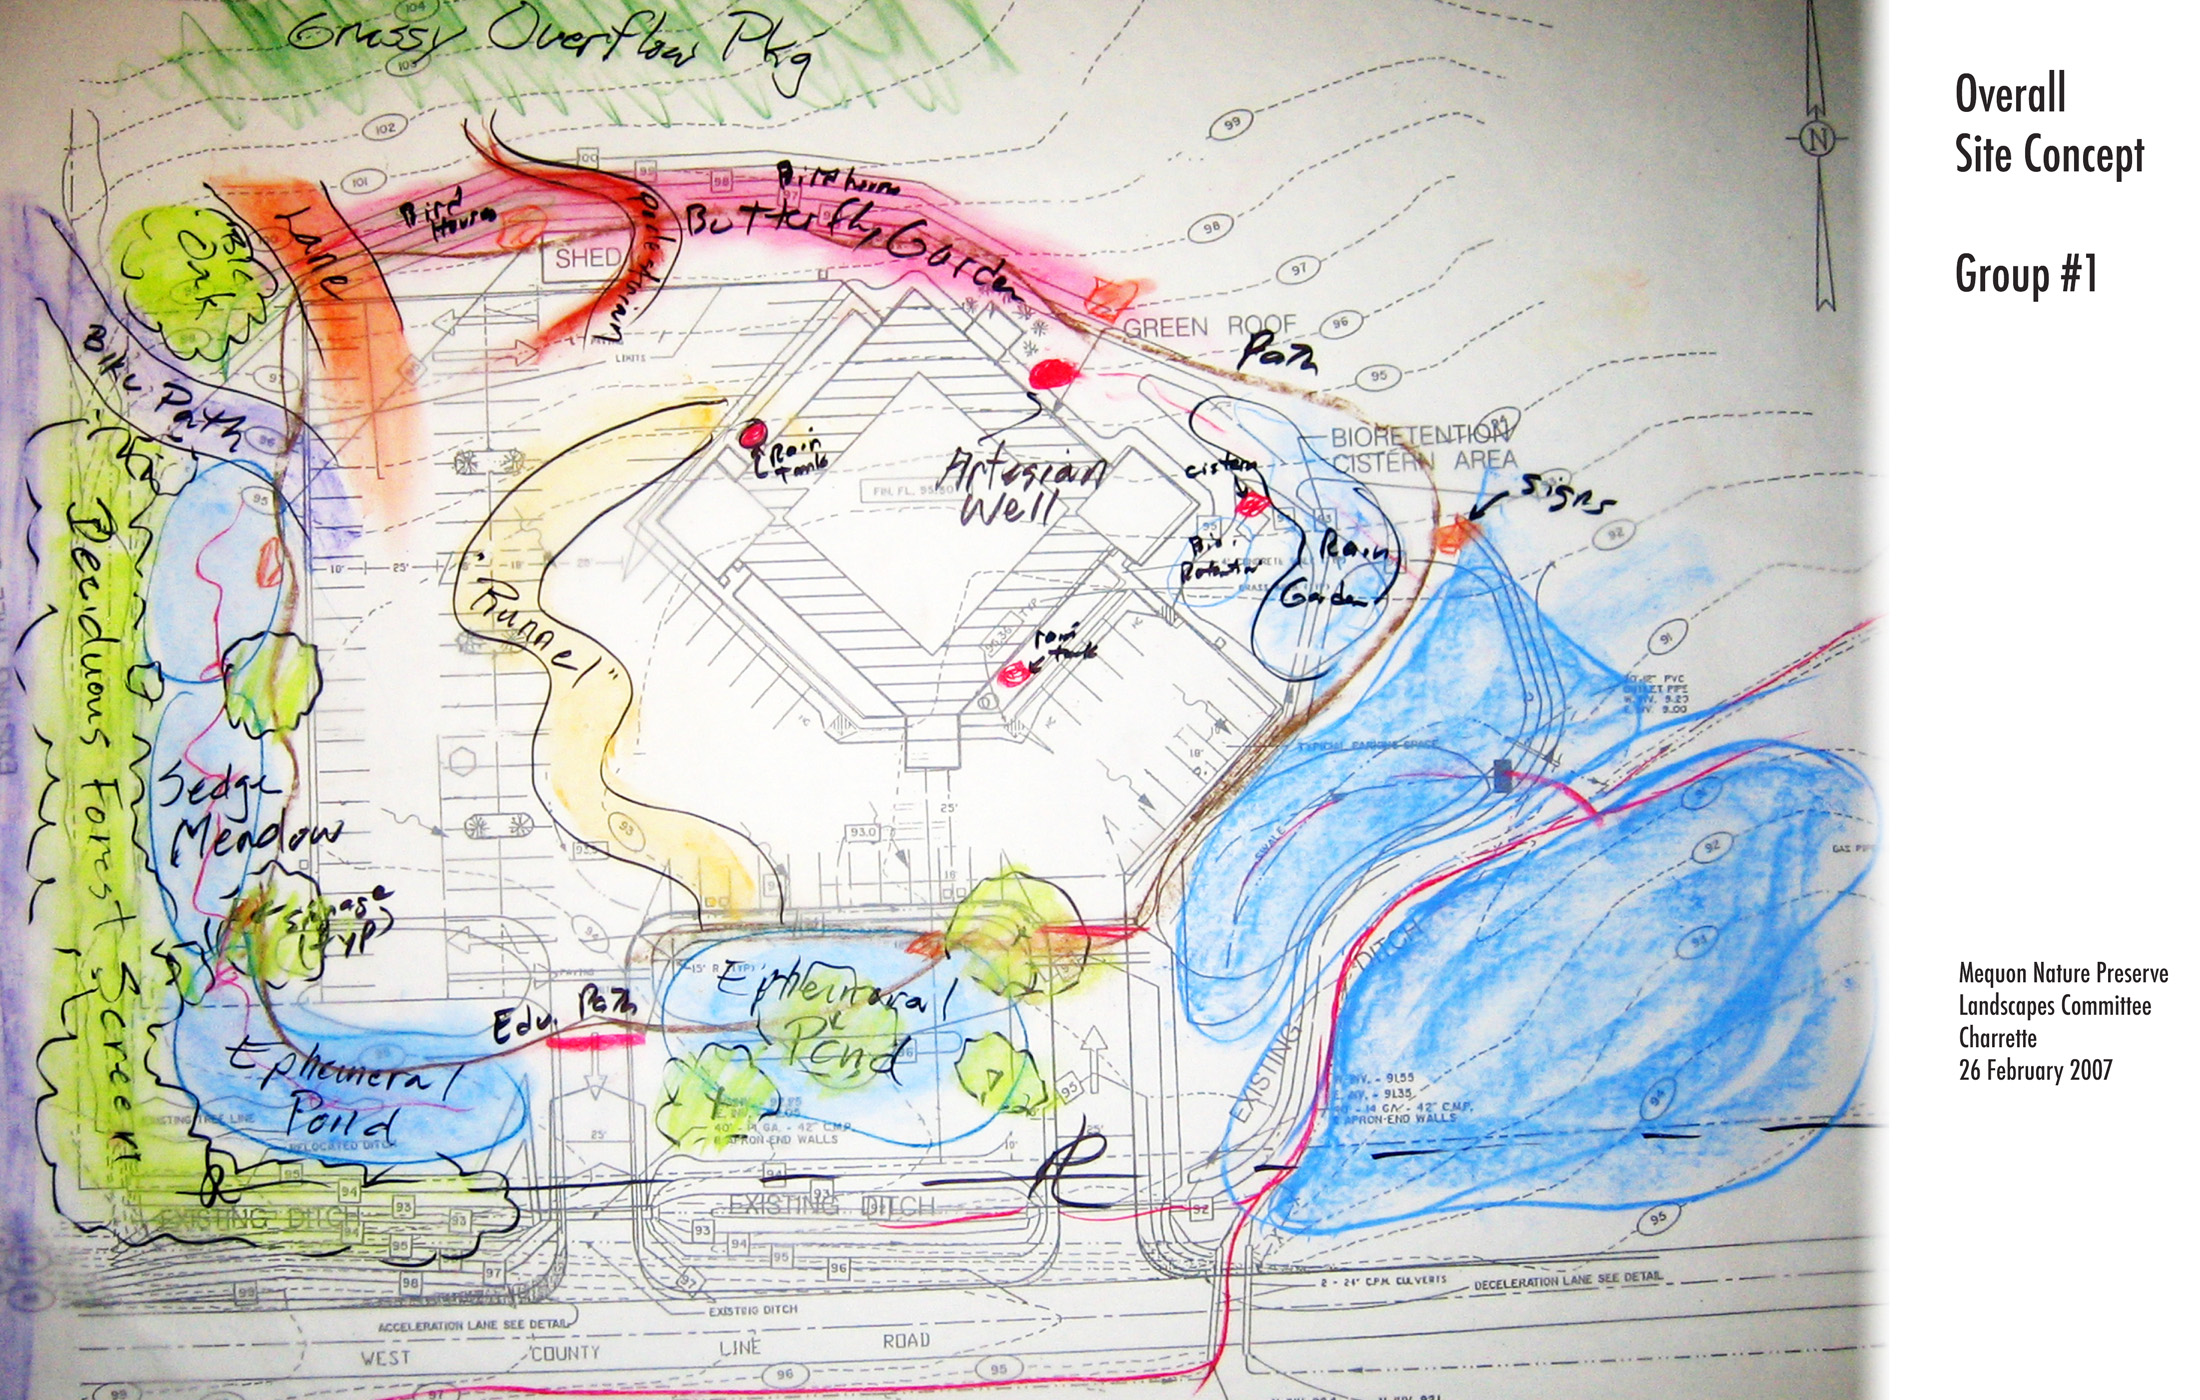 MNP-layout2-1-LoP-aten.jpg